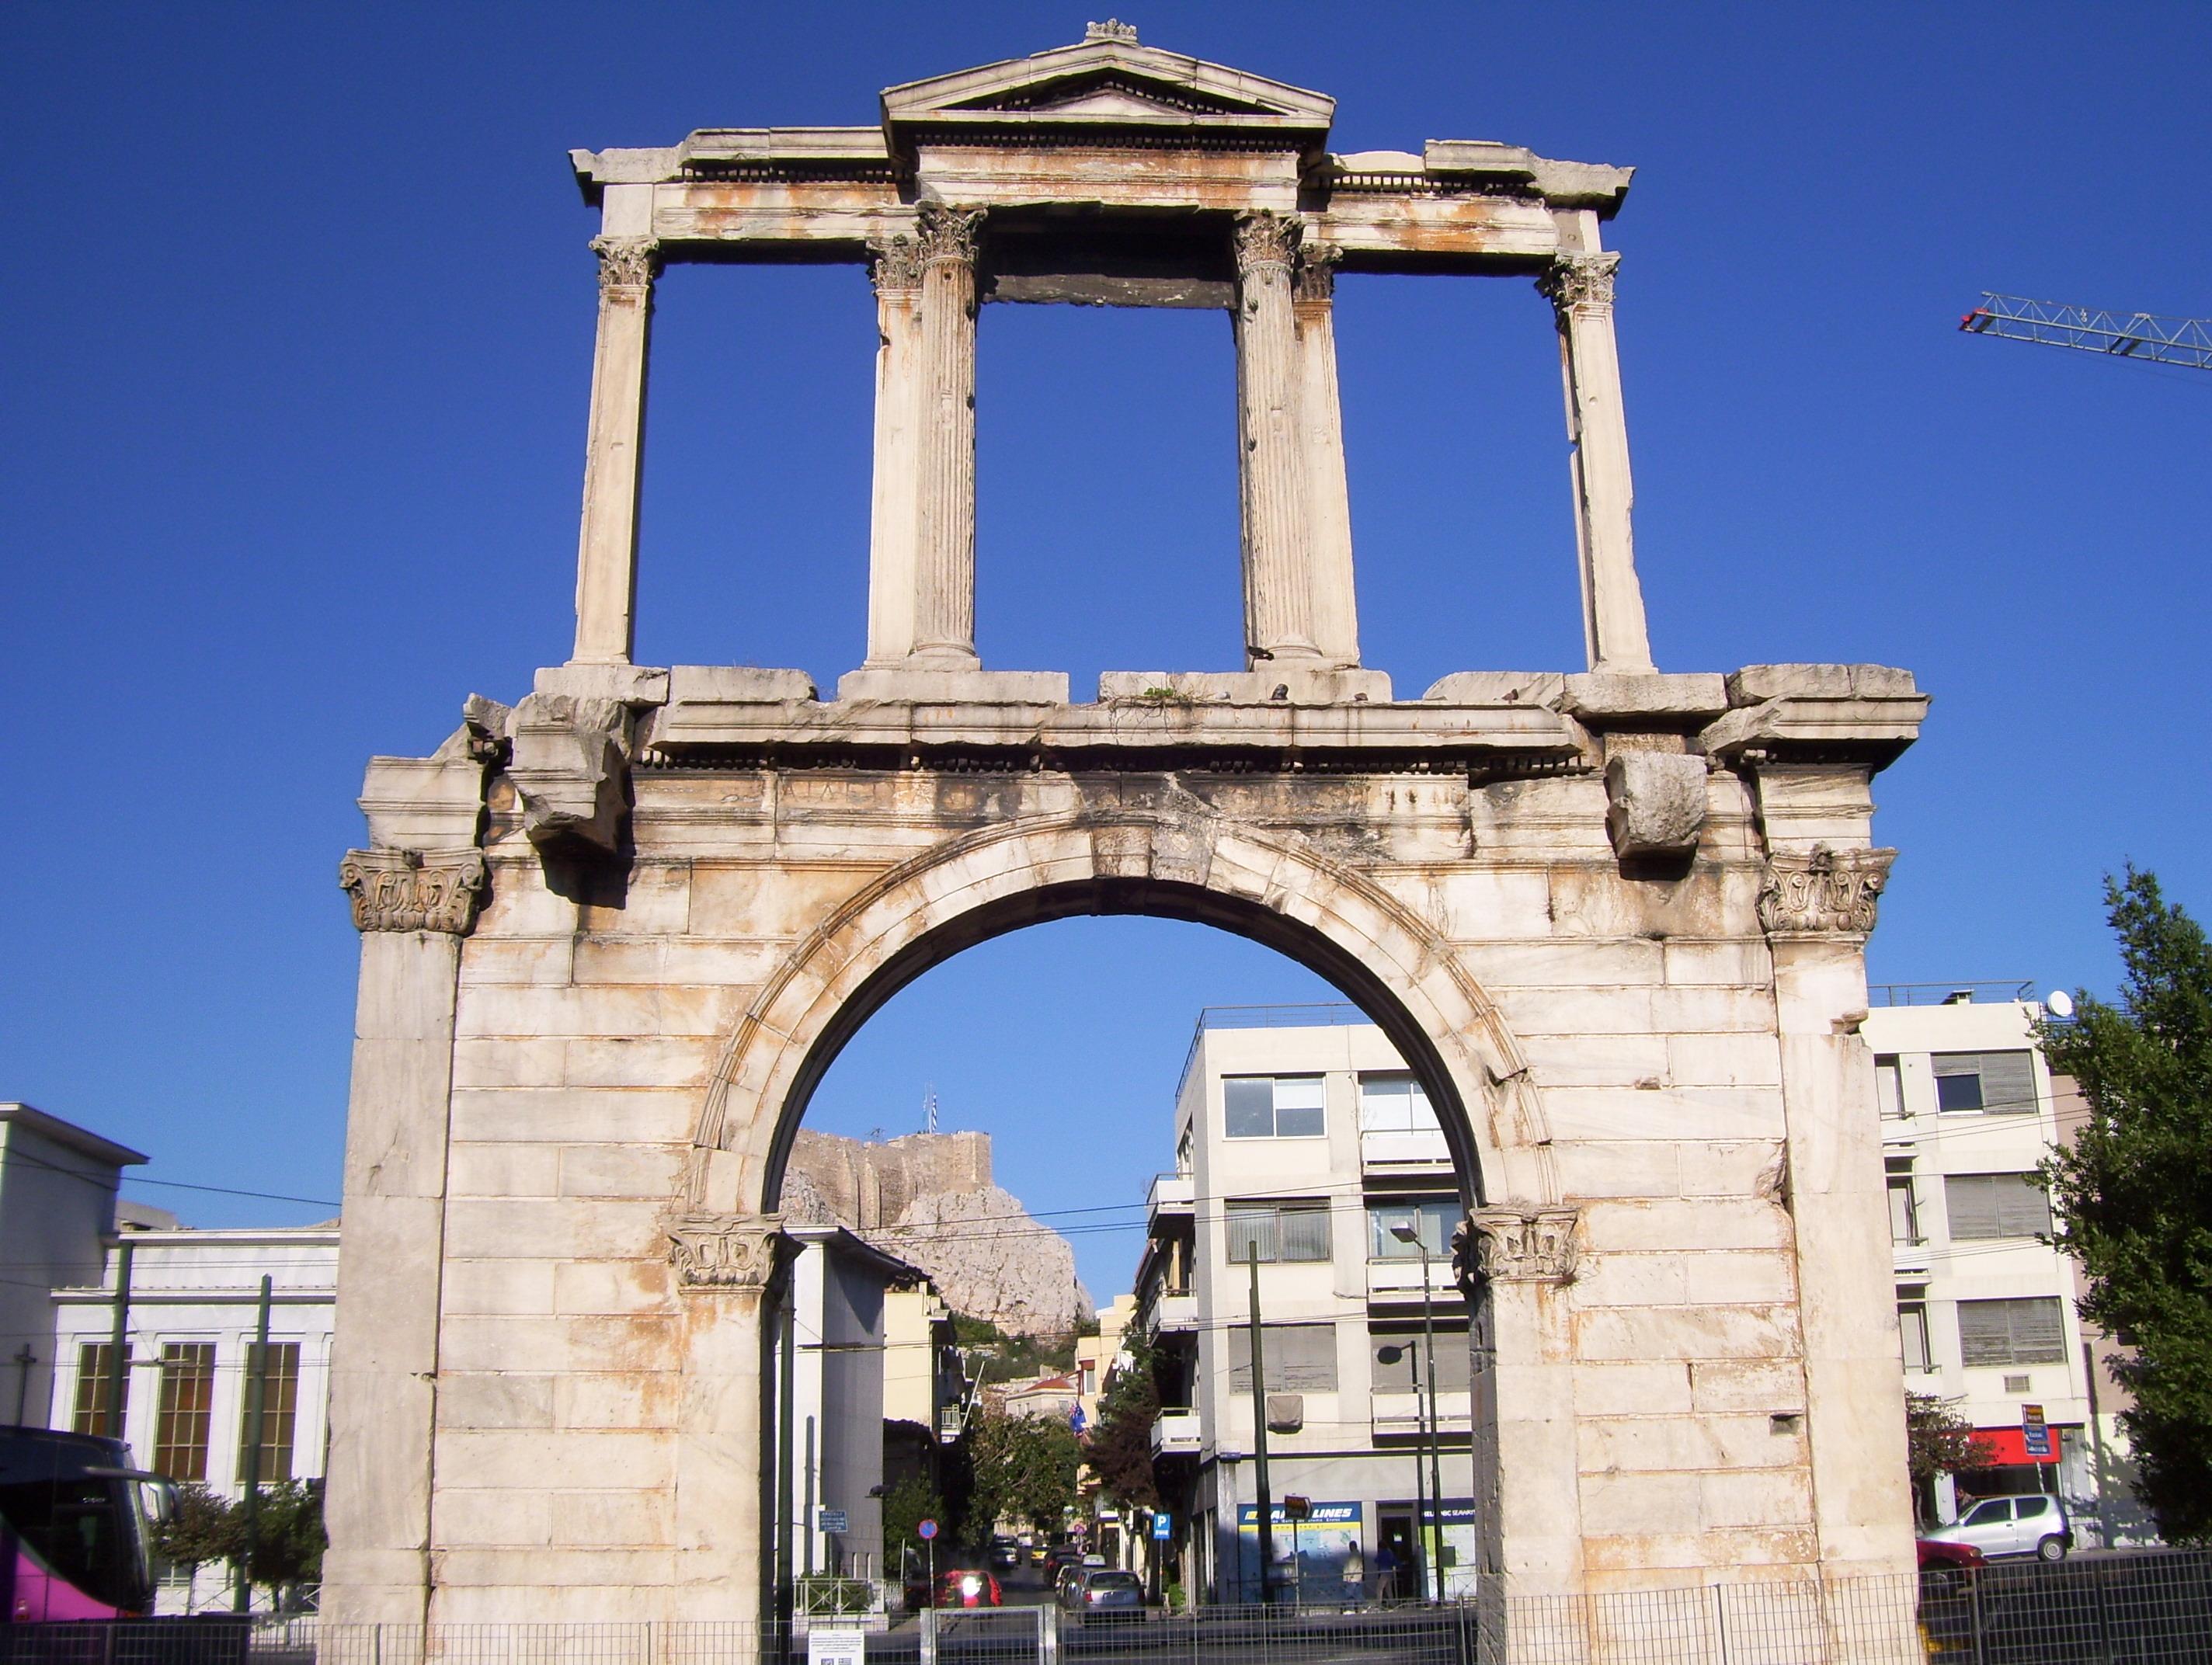 File:Hadrians Arch Greece.JPG - Wikimedia Commons